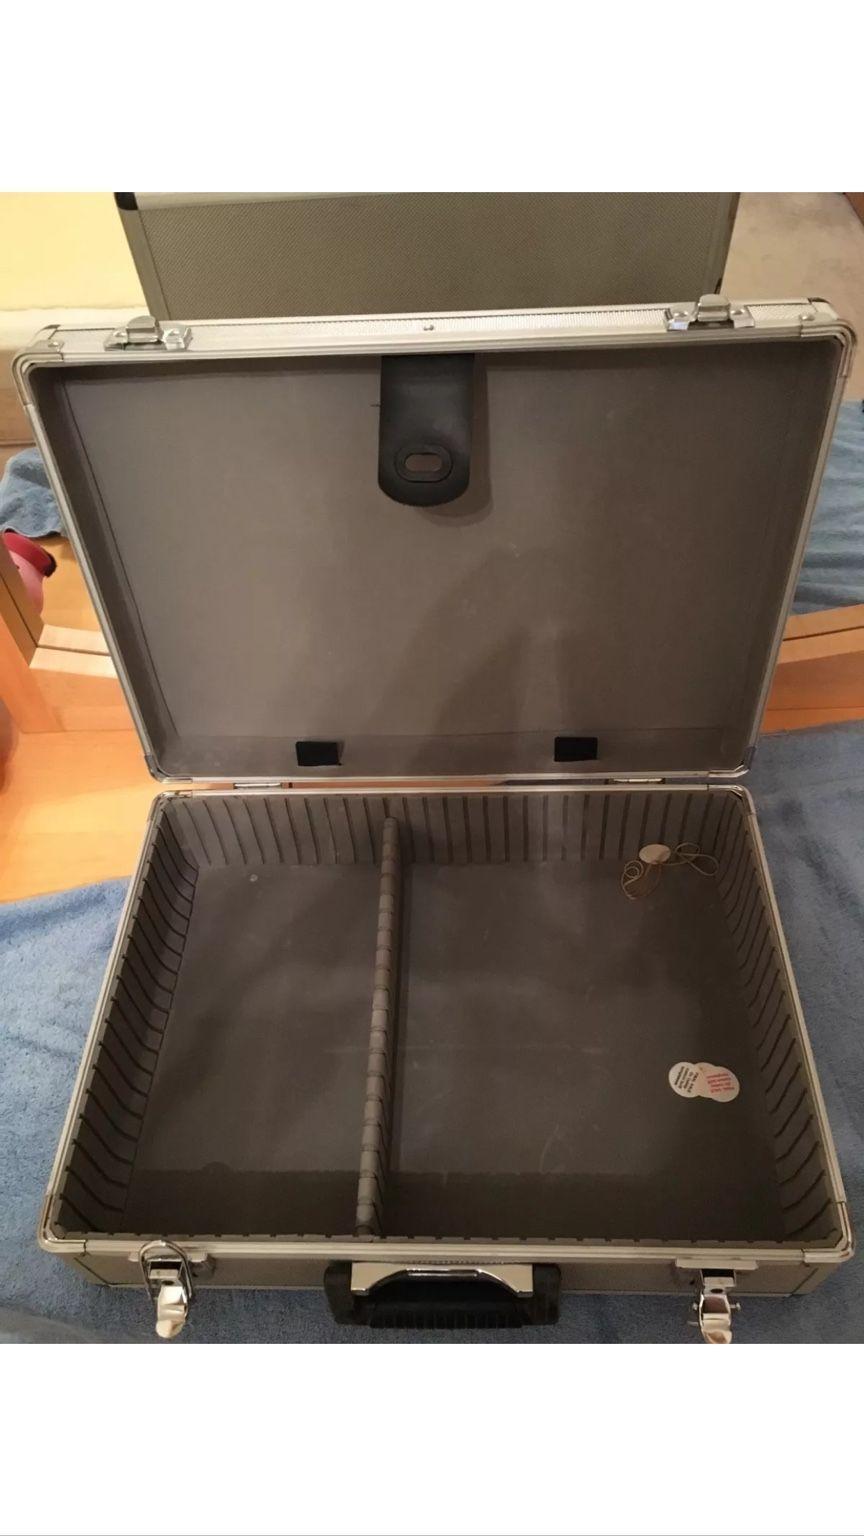 The 2016 Oakley Rep Case - d55ad2789c421886341d3f19b0fce3ae.jpg